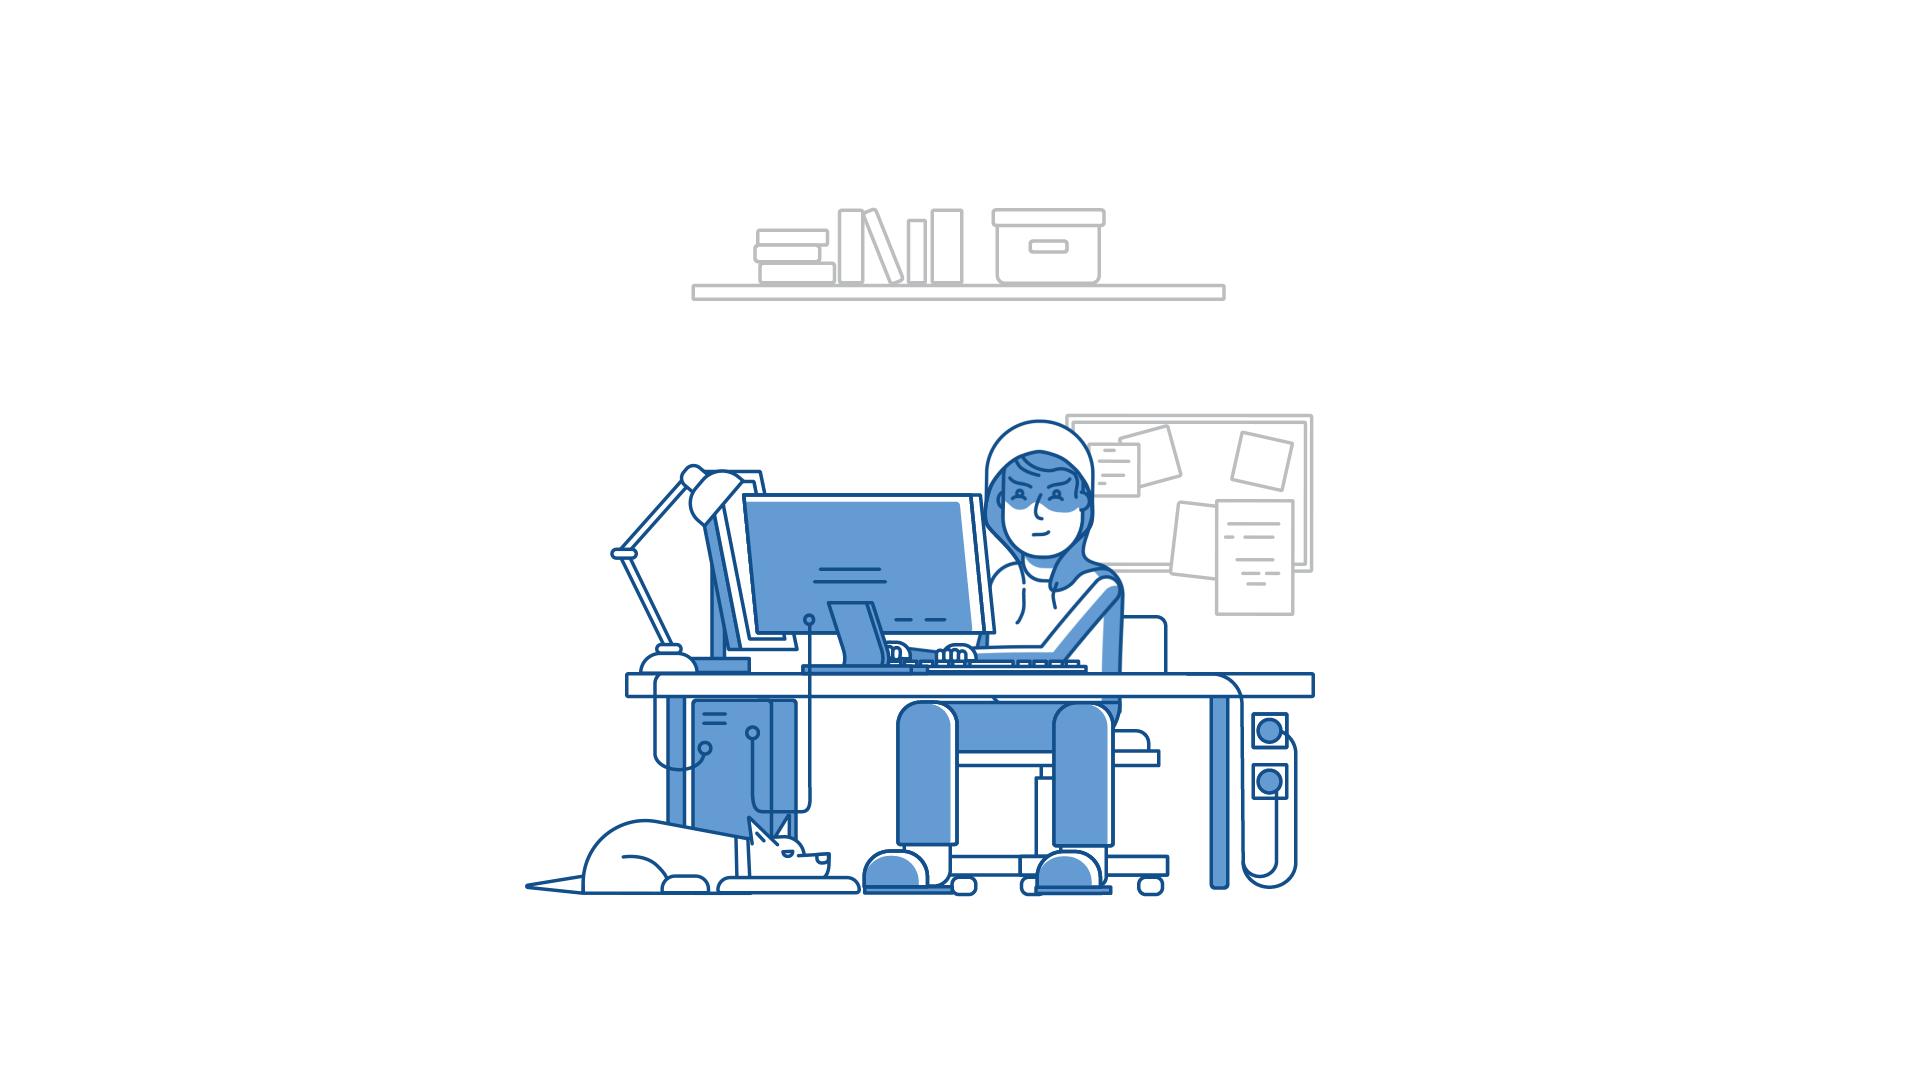 Mist Visual - Studio Animacji. Ósma ilustracja do animacji NASK DNSSEC Video Explainer